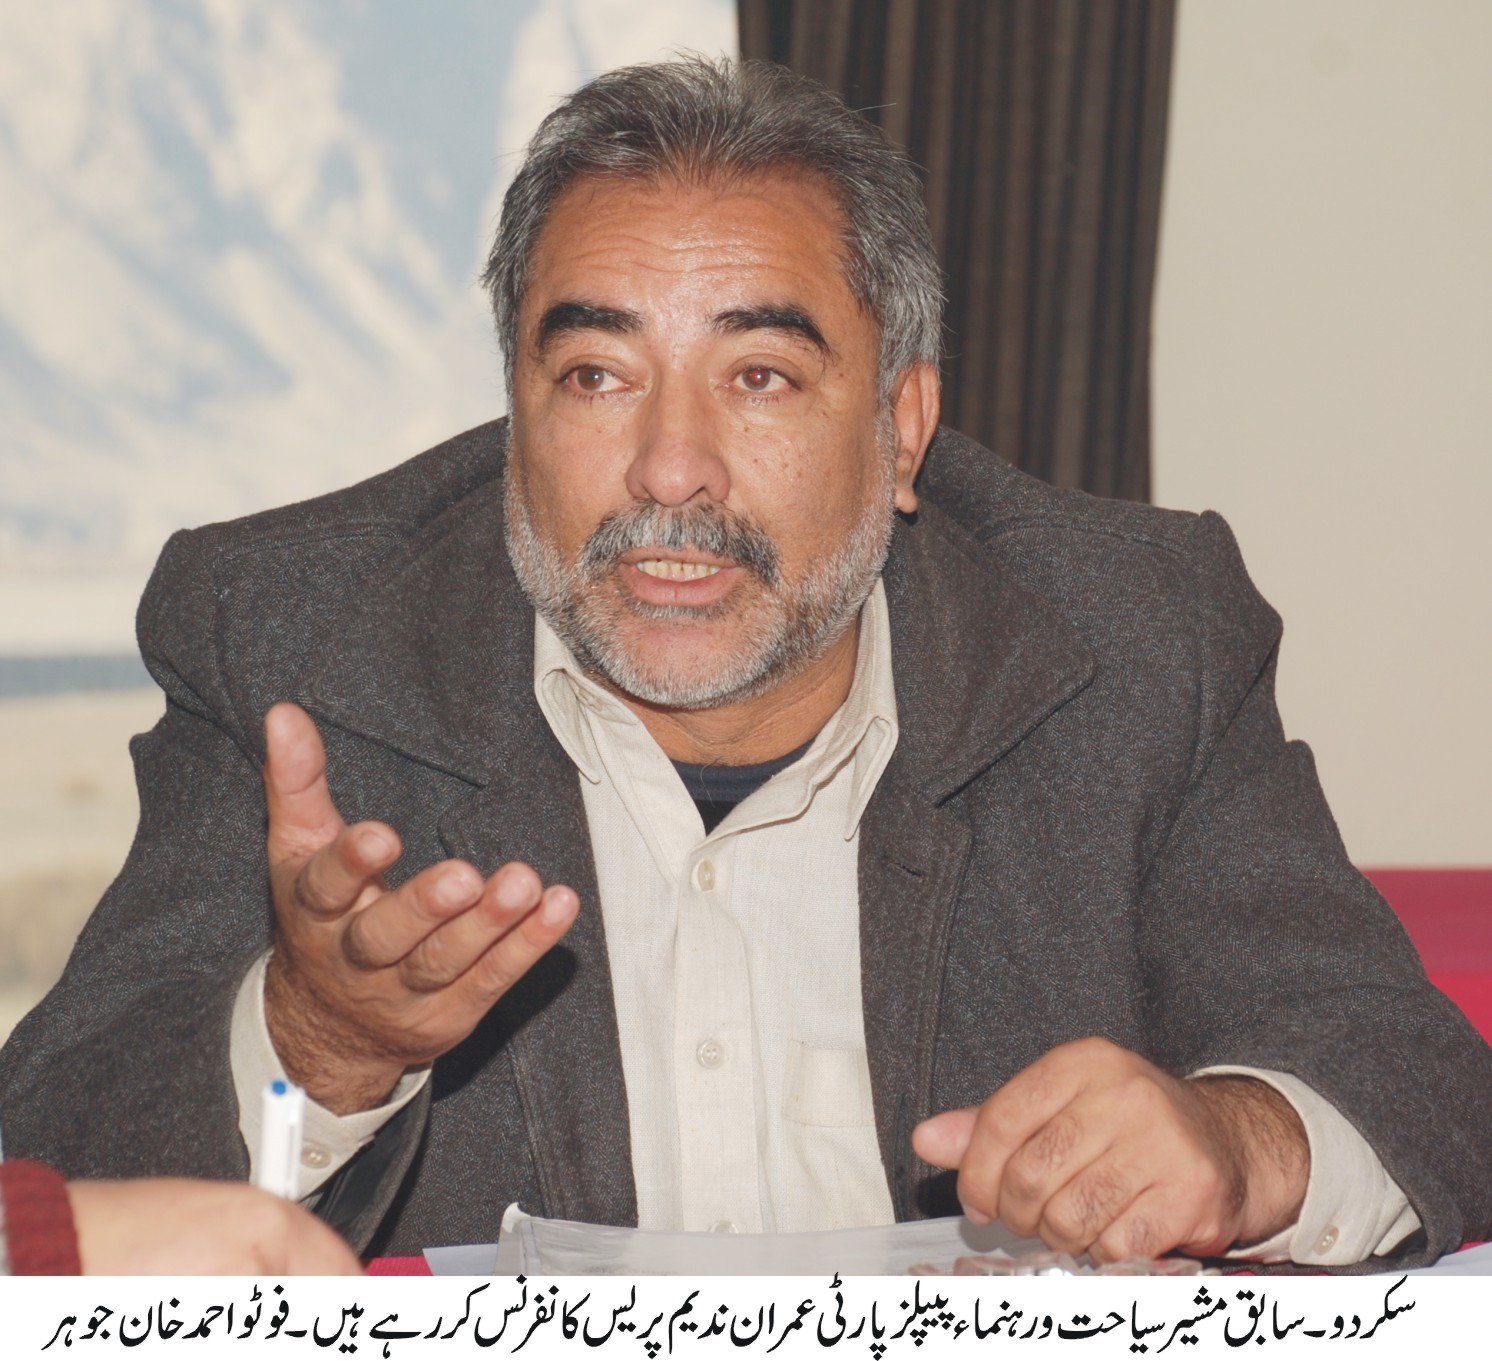 وفاق گلگت بلتستان کے ساتھ بلوچستان جیسا سلوک نہ کرے، عمران ندیم